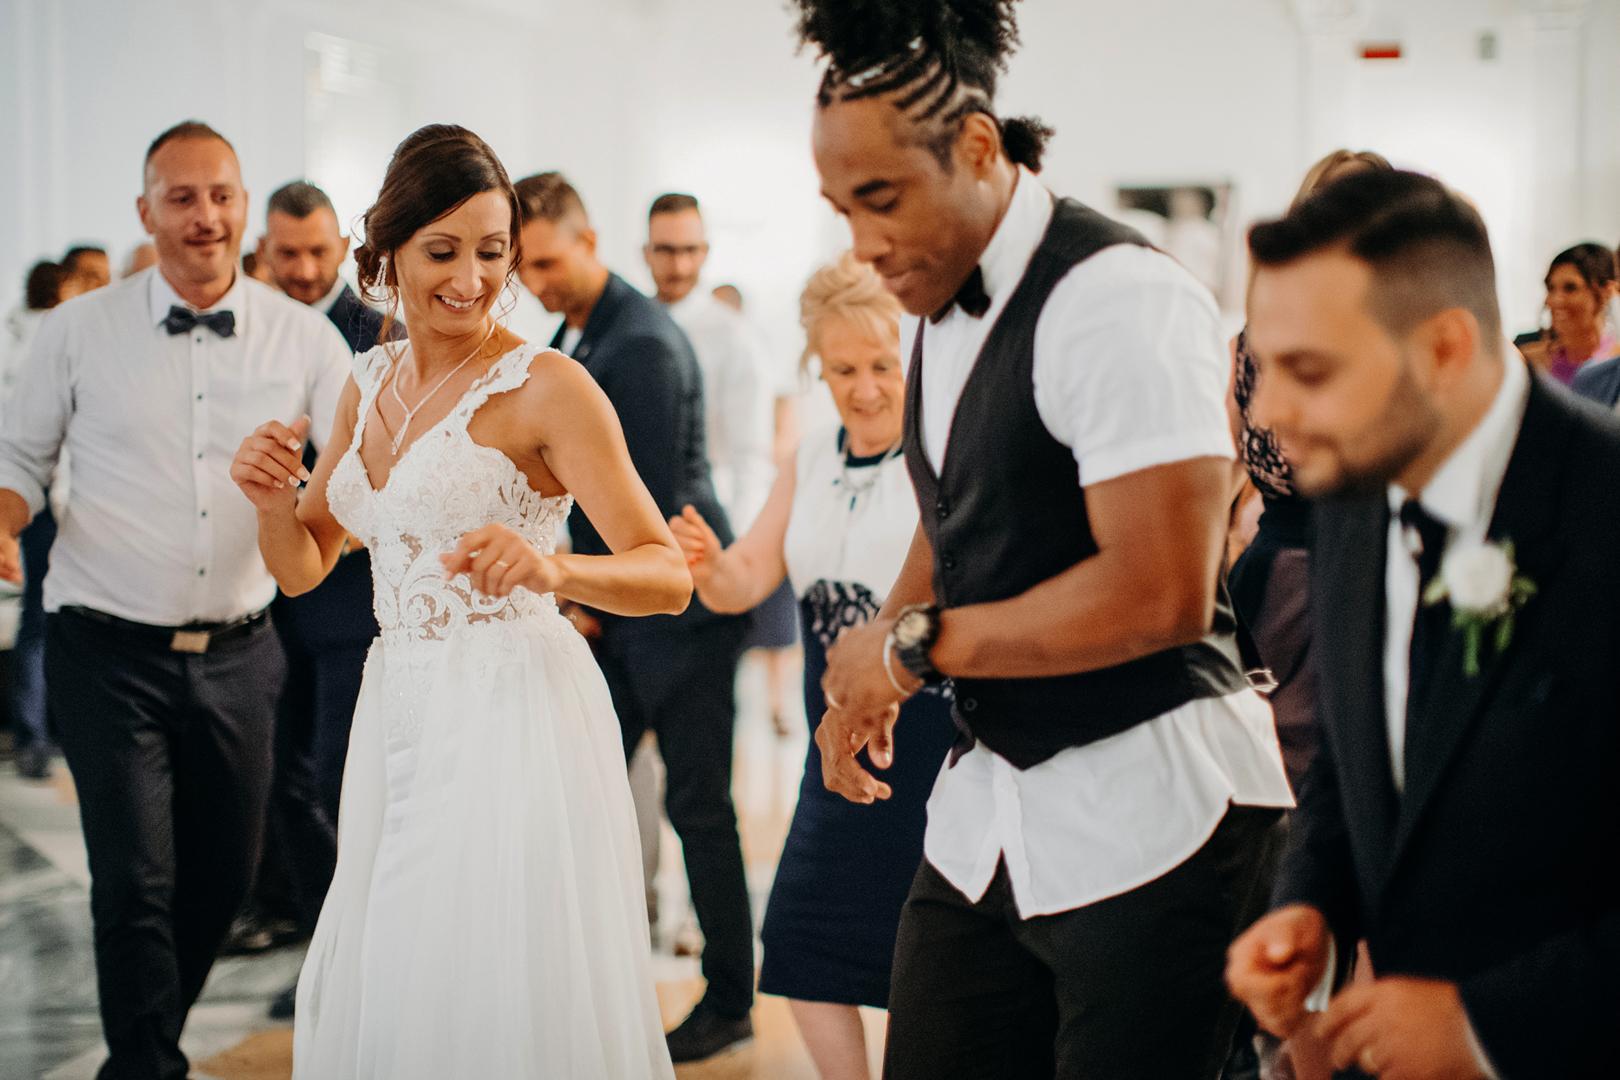 26 gianni-lepore-fotogtafo-molfetta-new-lions-balli-dancing